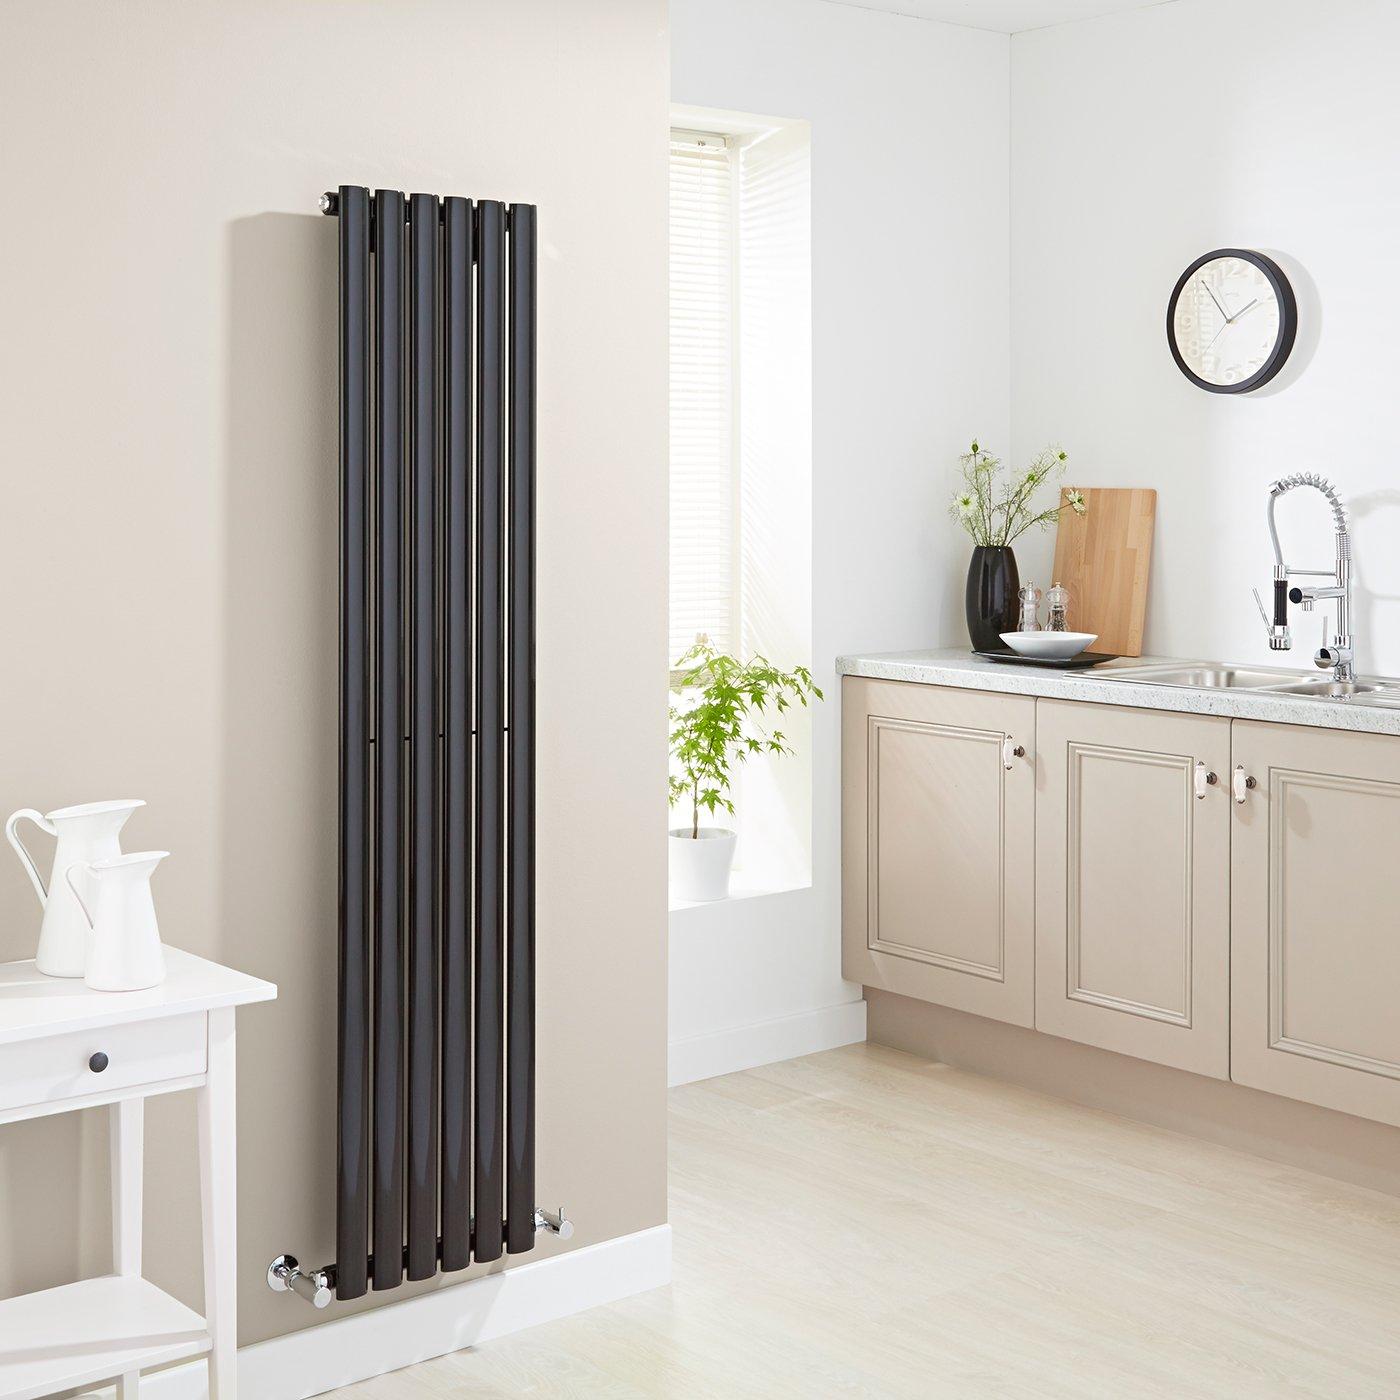 Termosifone design verticale nero in cucina con pareti tortora.